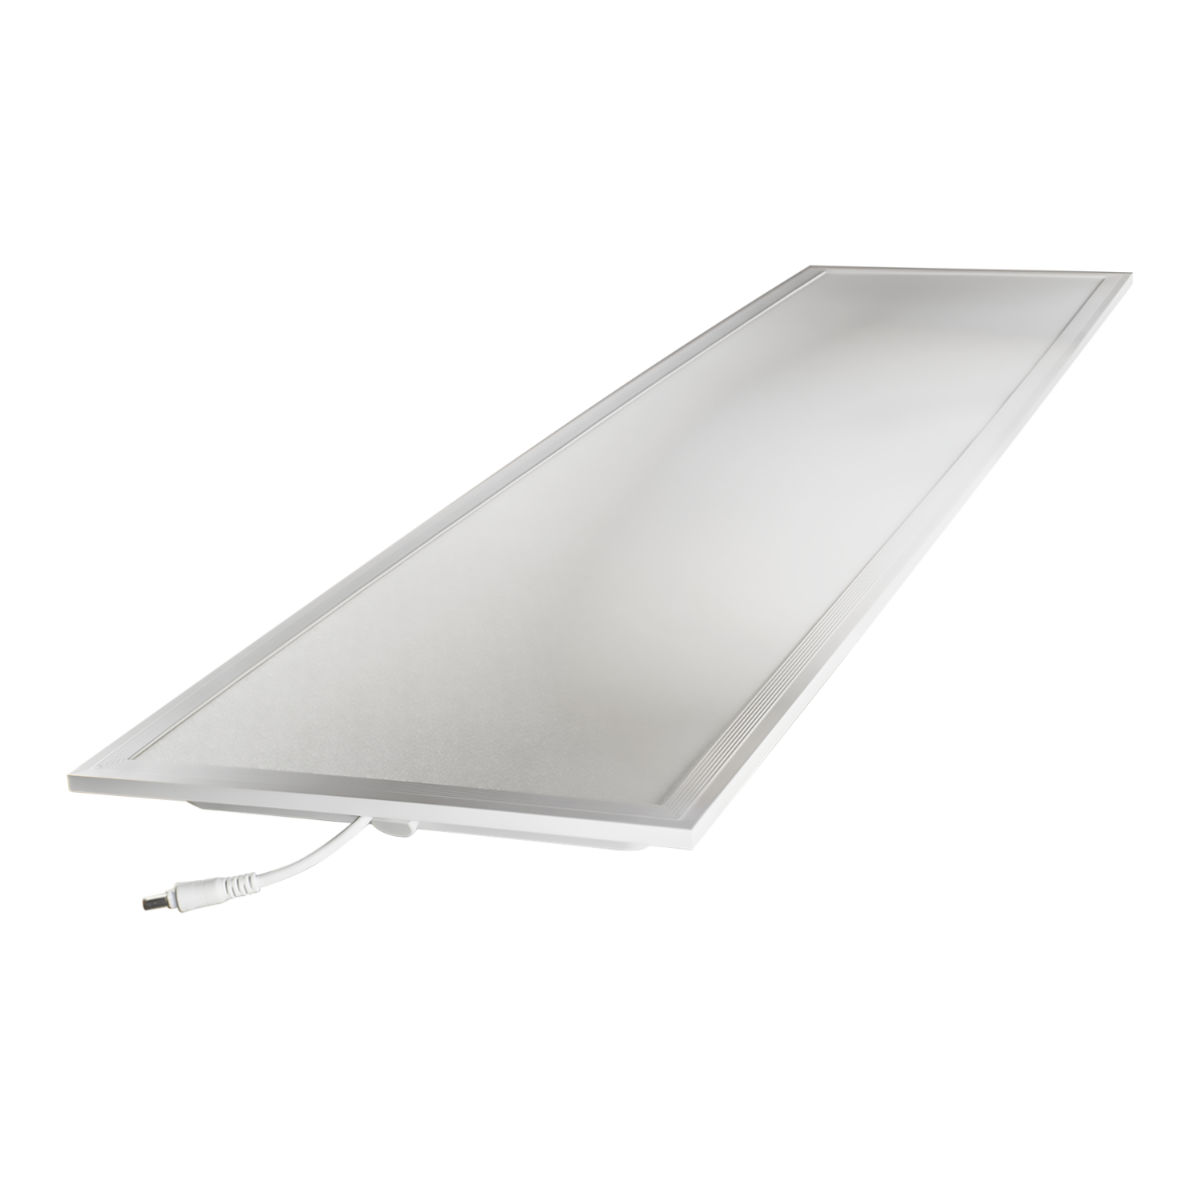 Noxion LED Panel Delta Pro V2.0 Xitanium DALI 30W 30x120cm 6500K 4110lm UGR <19 | Dali Dimmable - Daylight - Replaces 2x36W